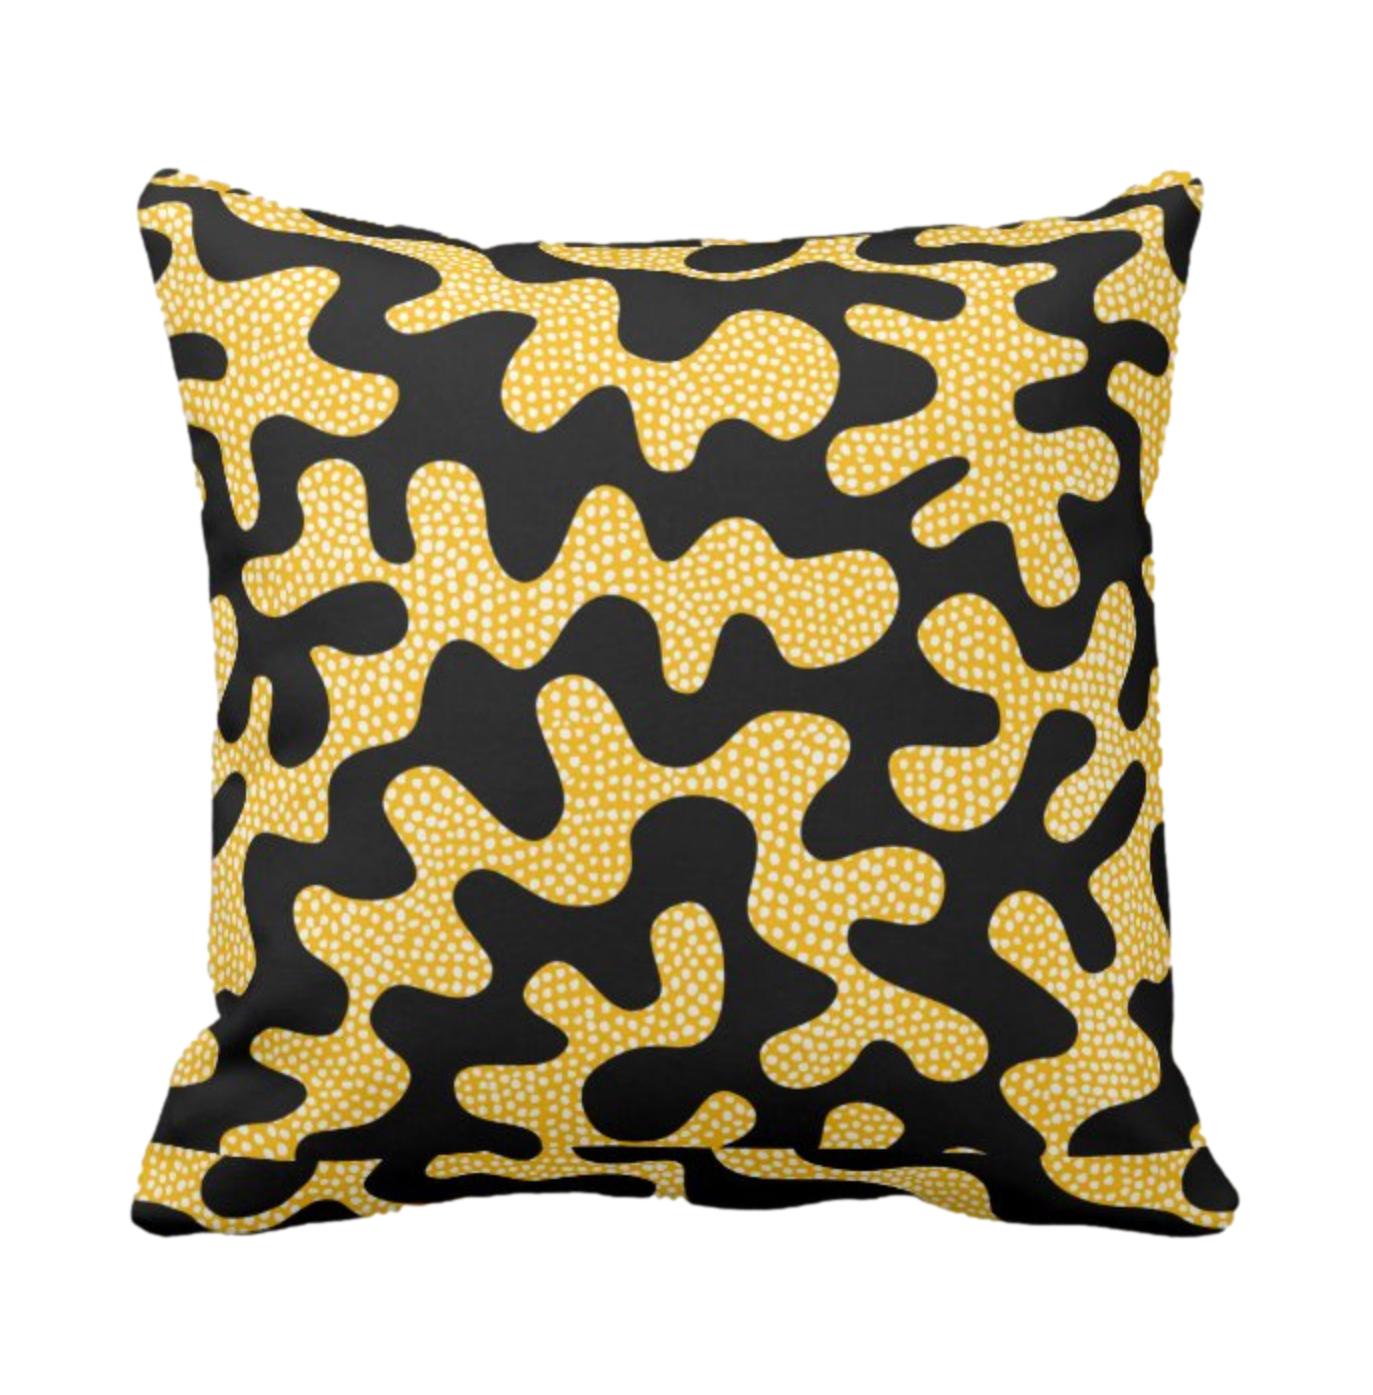 Afro Patchwork Print Design 4 Throw Cushion